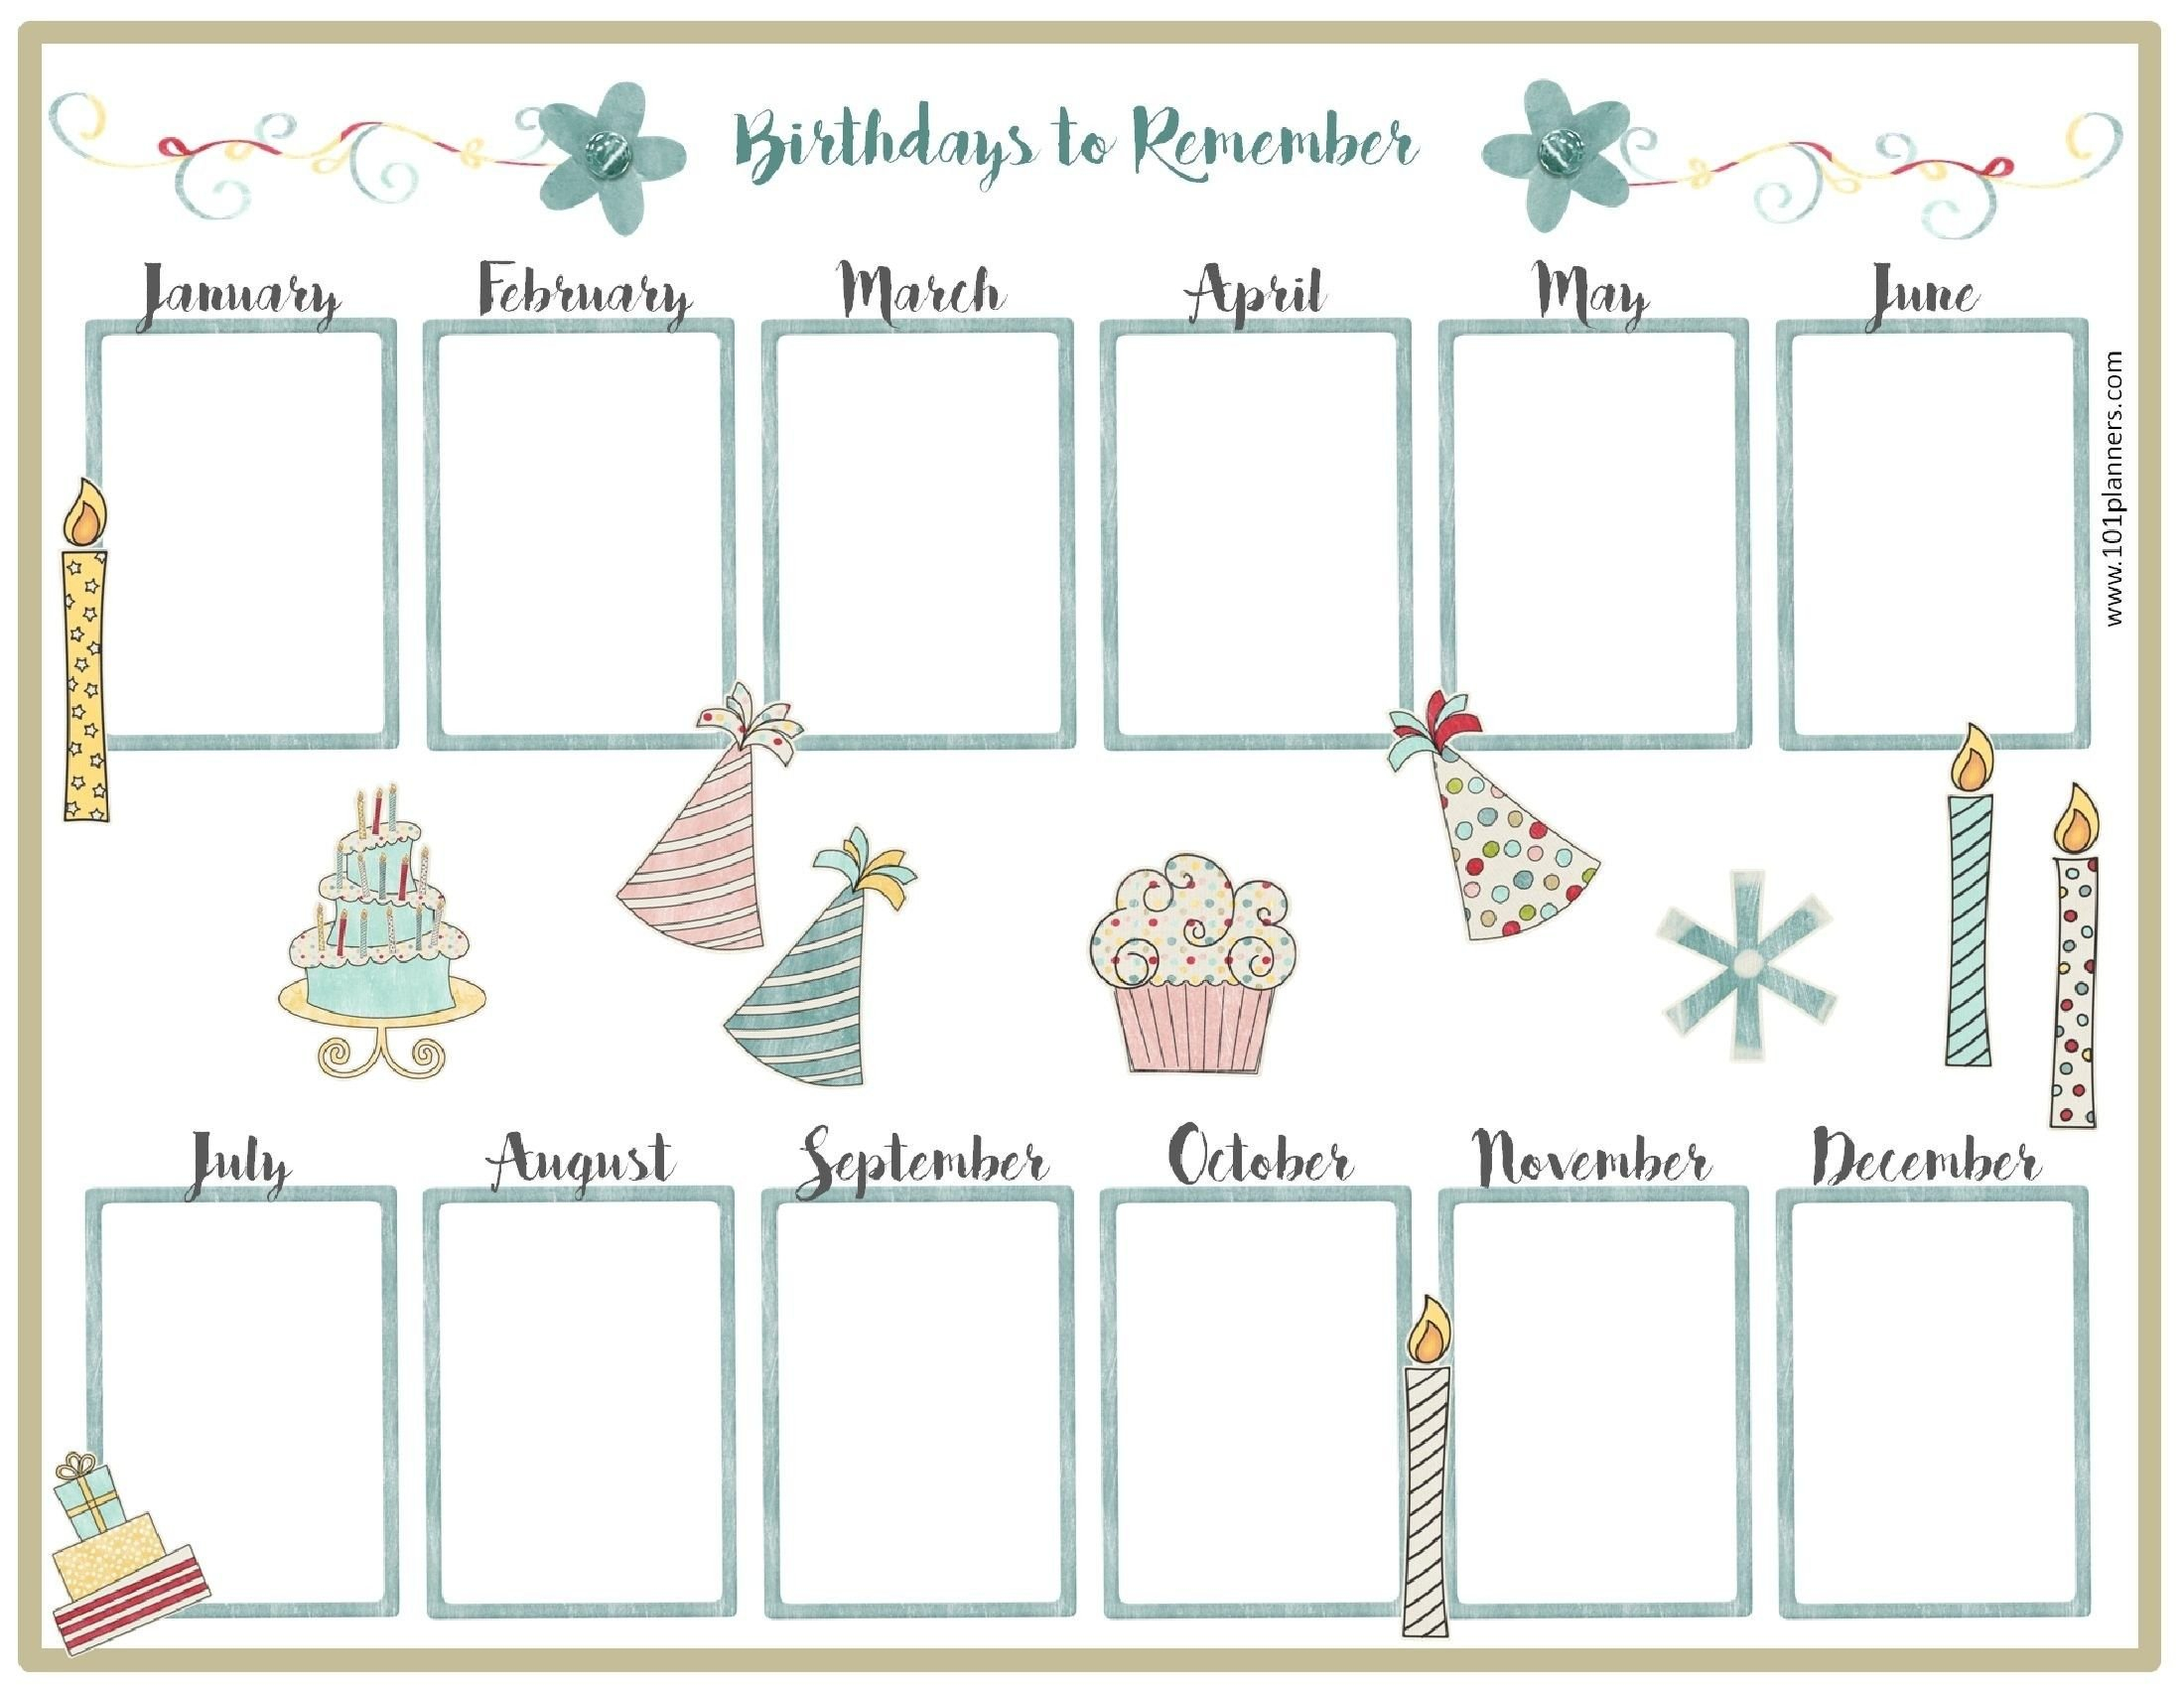 Birthday Calendar Template Free Download Birthday Calendar Editable Birthday Calendar Template Free